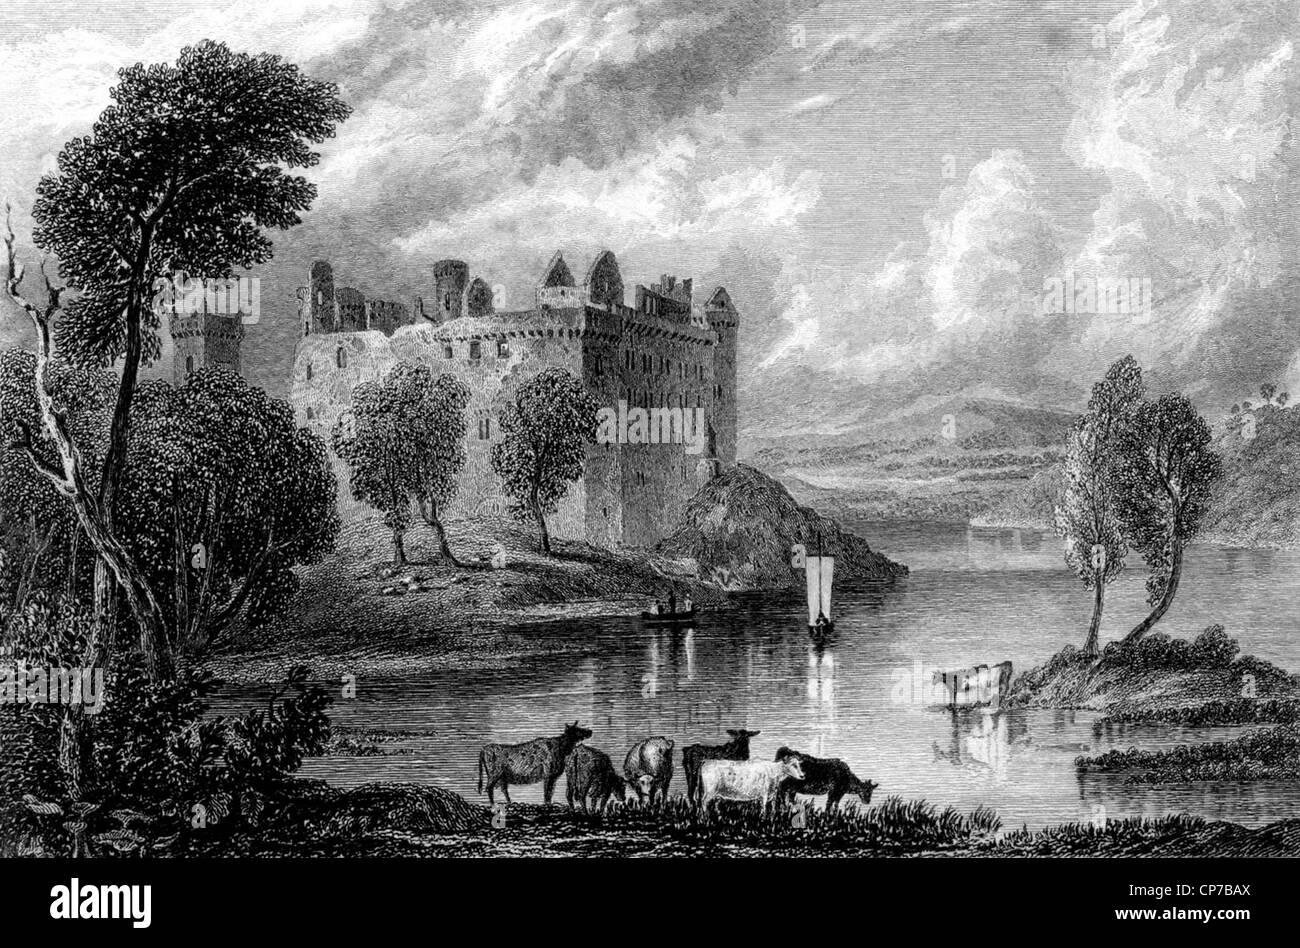 Engraving of Linlithgow Castle, West Lothian, Scotland. - Stock Image